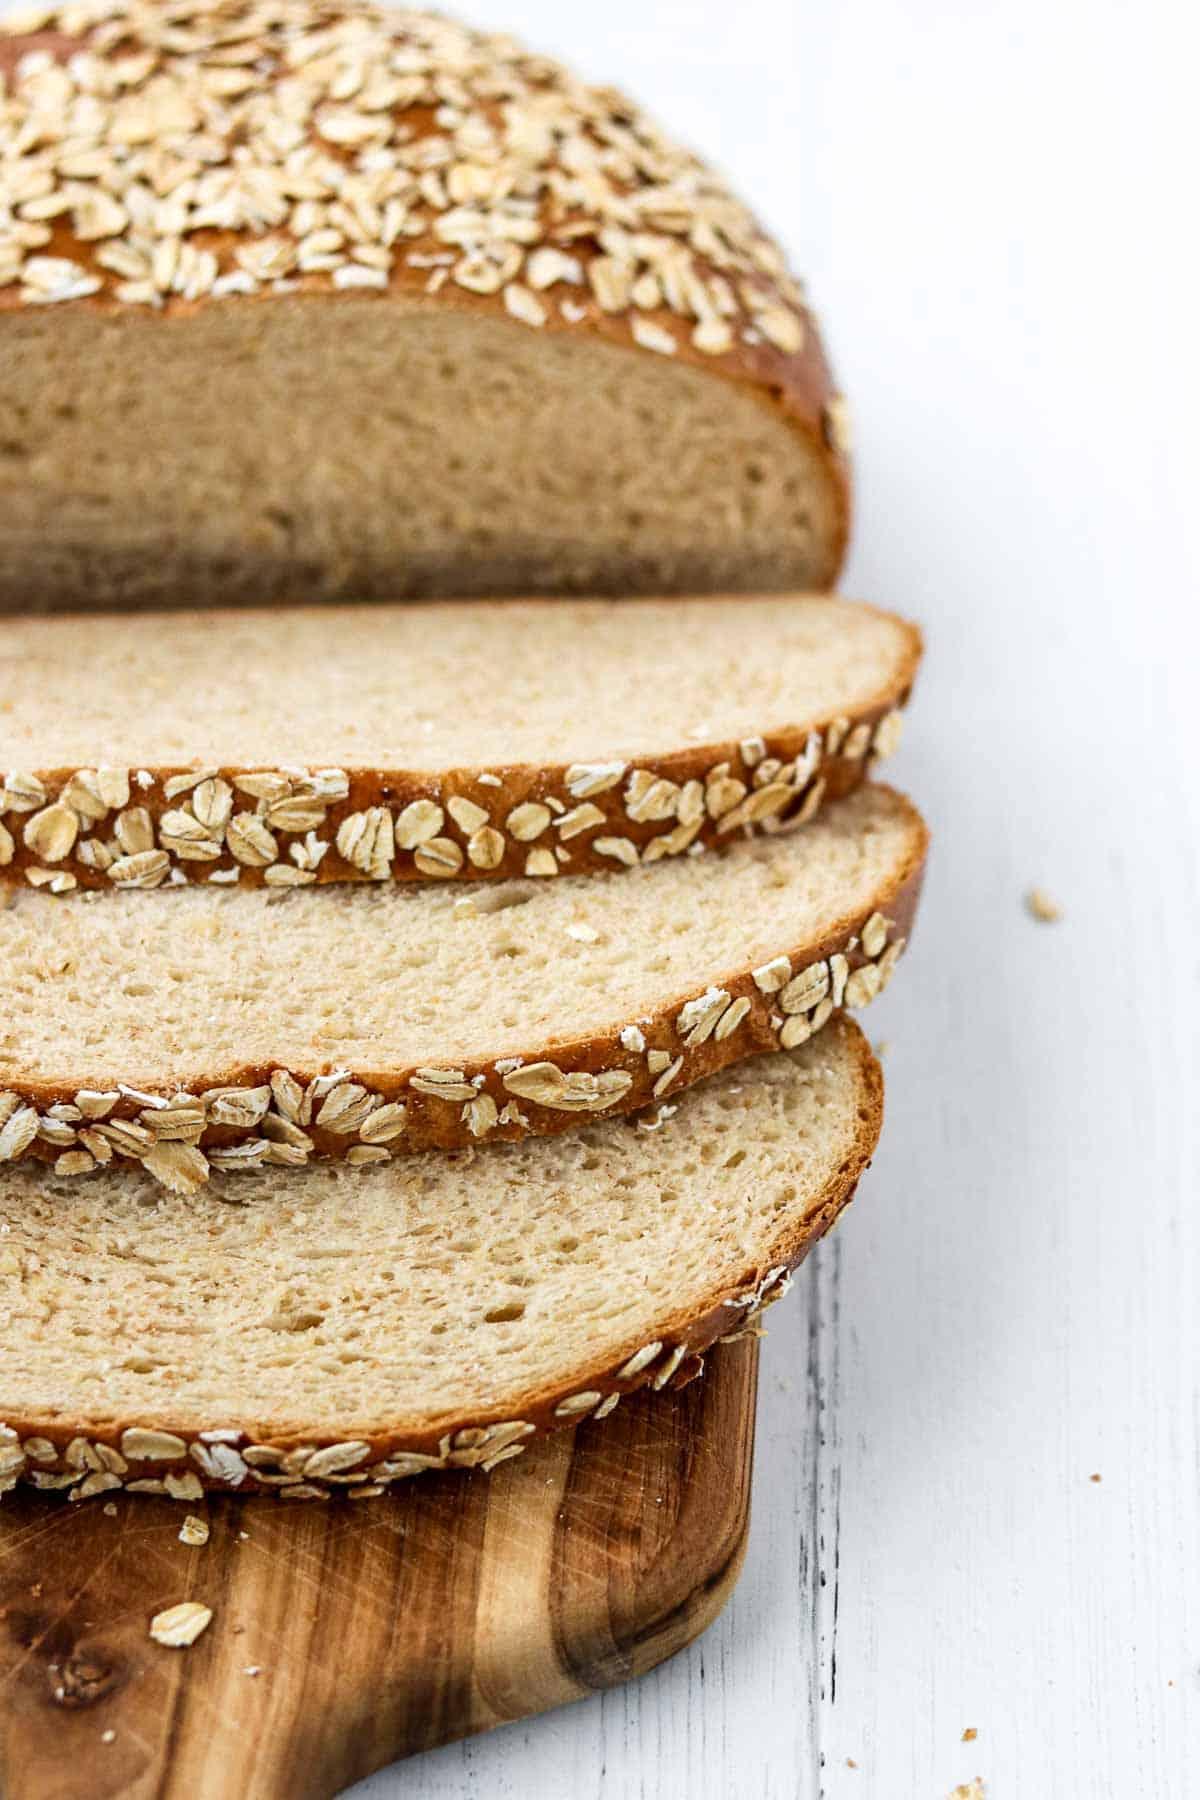 Danish oat bread sliced on a cutting board.